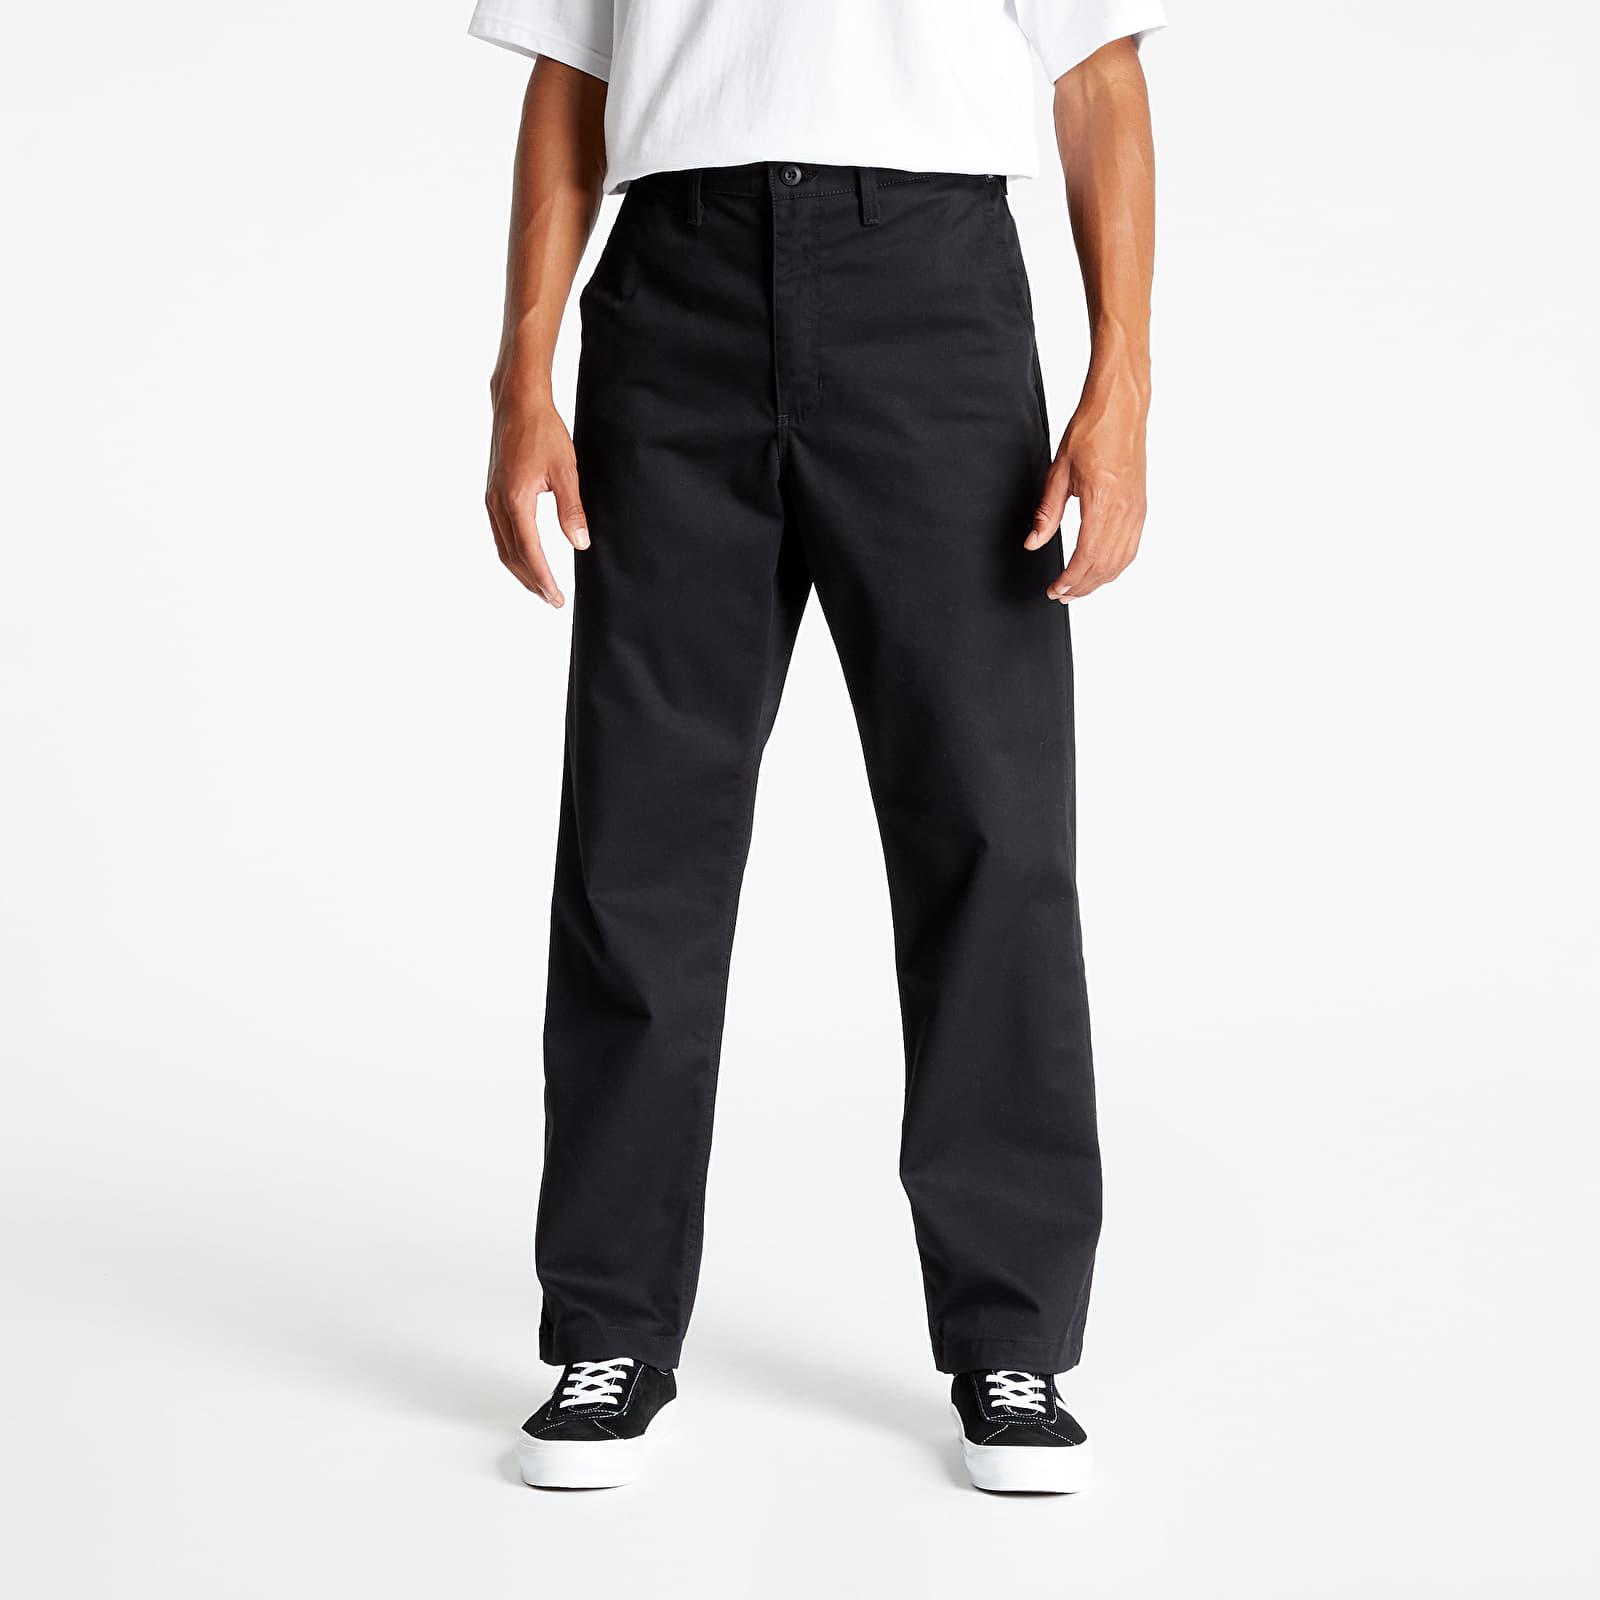 Vans Authentic Chino Loose Pant Black